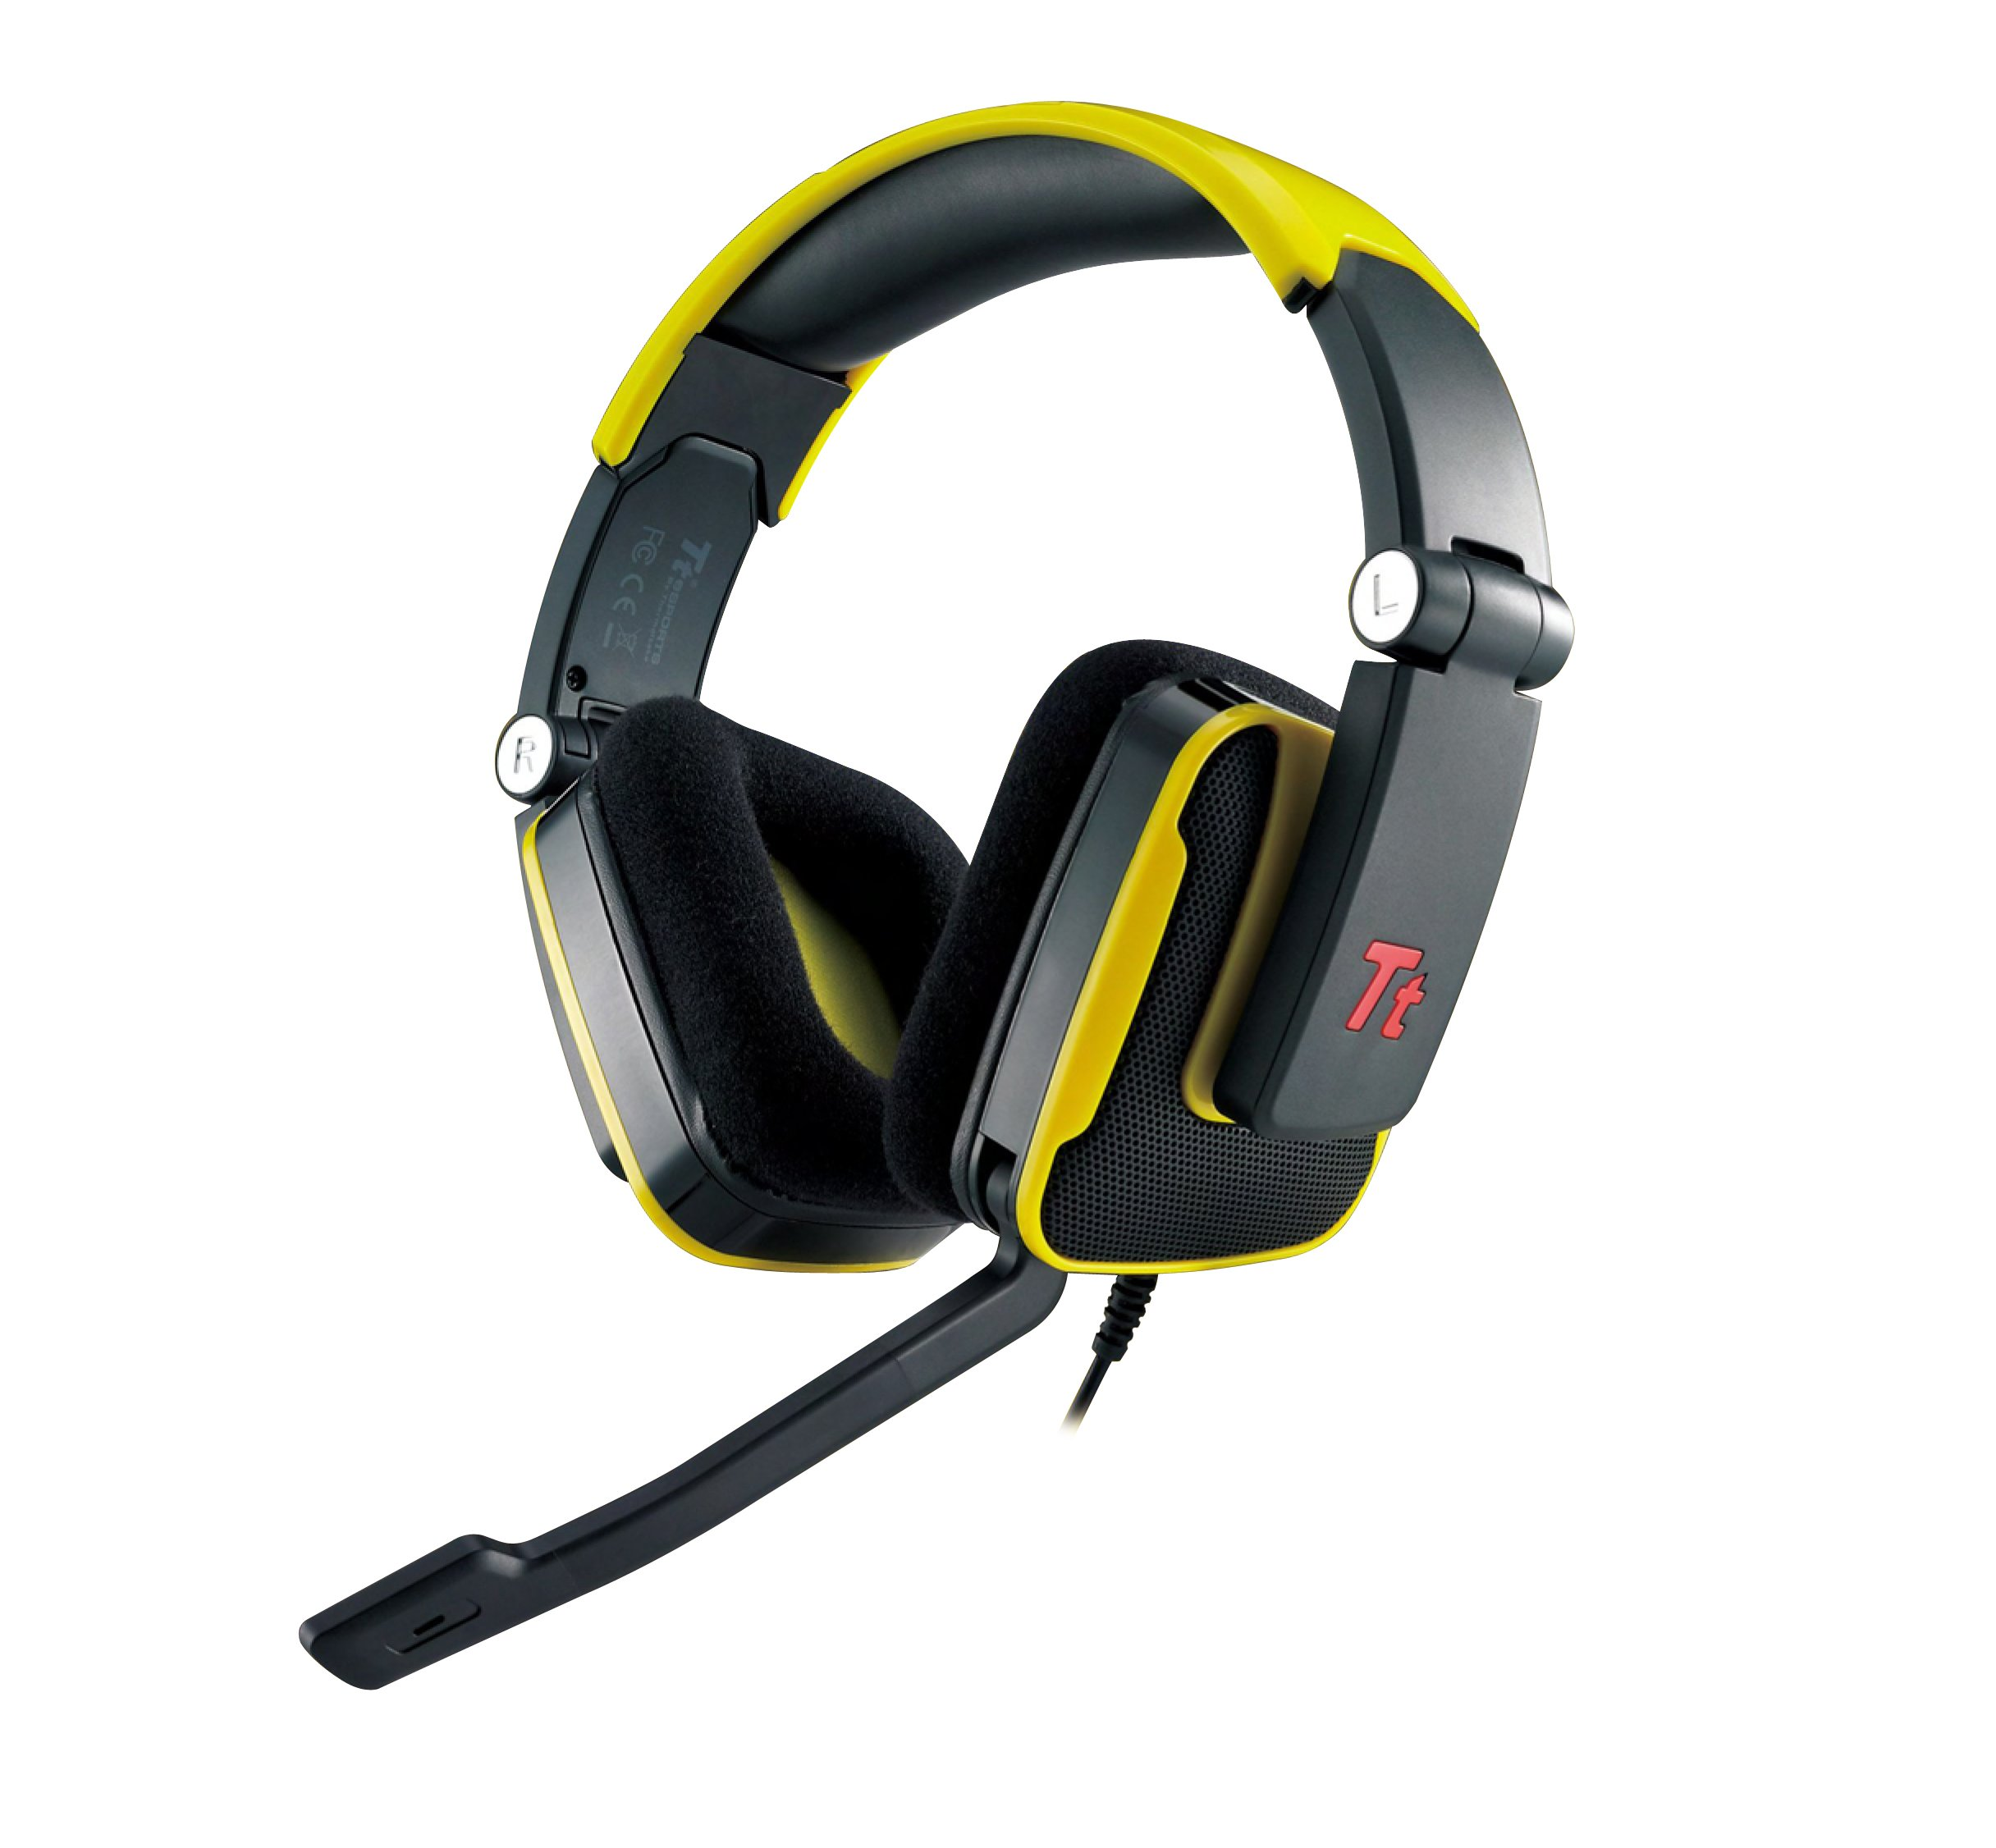 Tt eSPORTS HT-SHK002ECYE Thermaltake SHOCK Gaming Headset,..